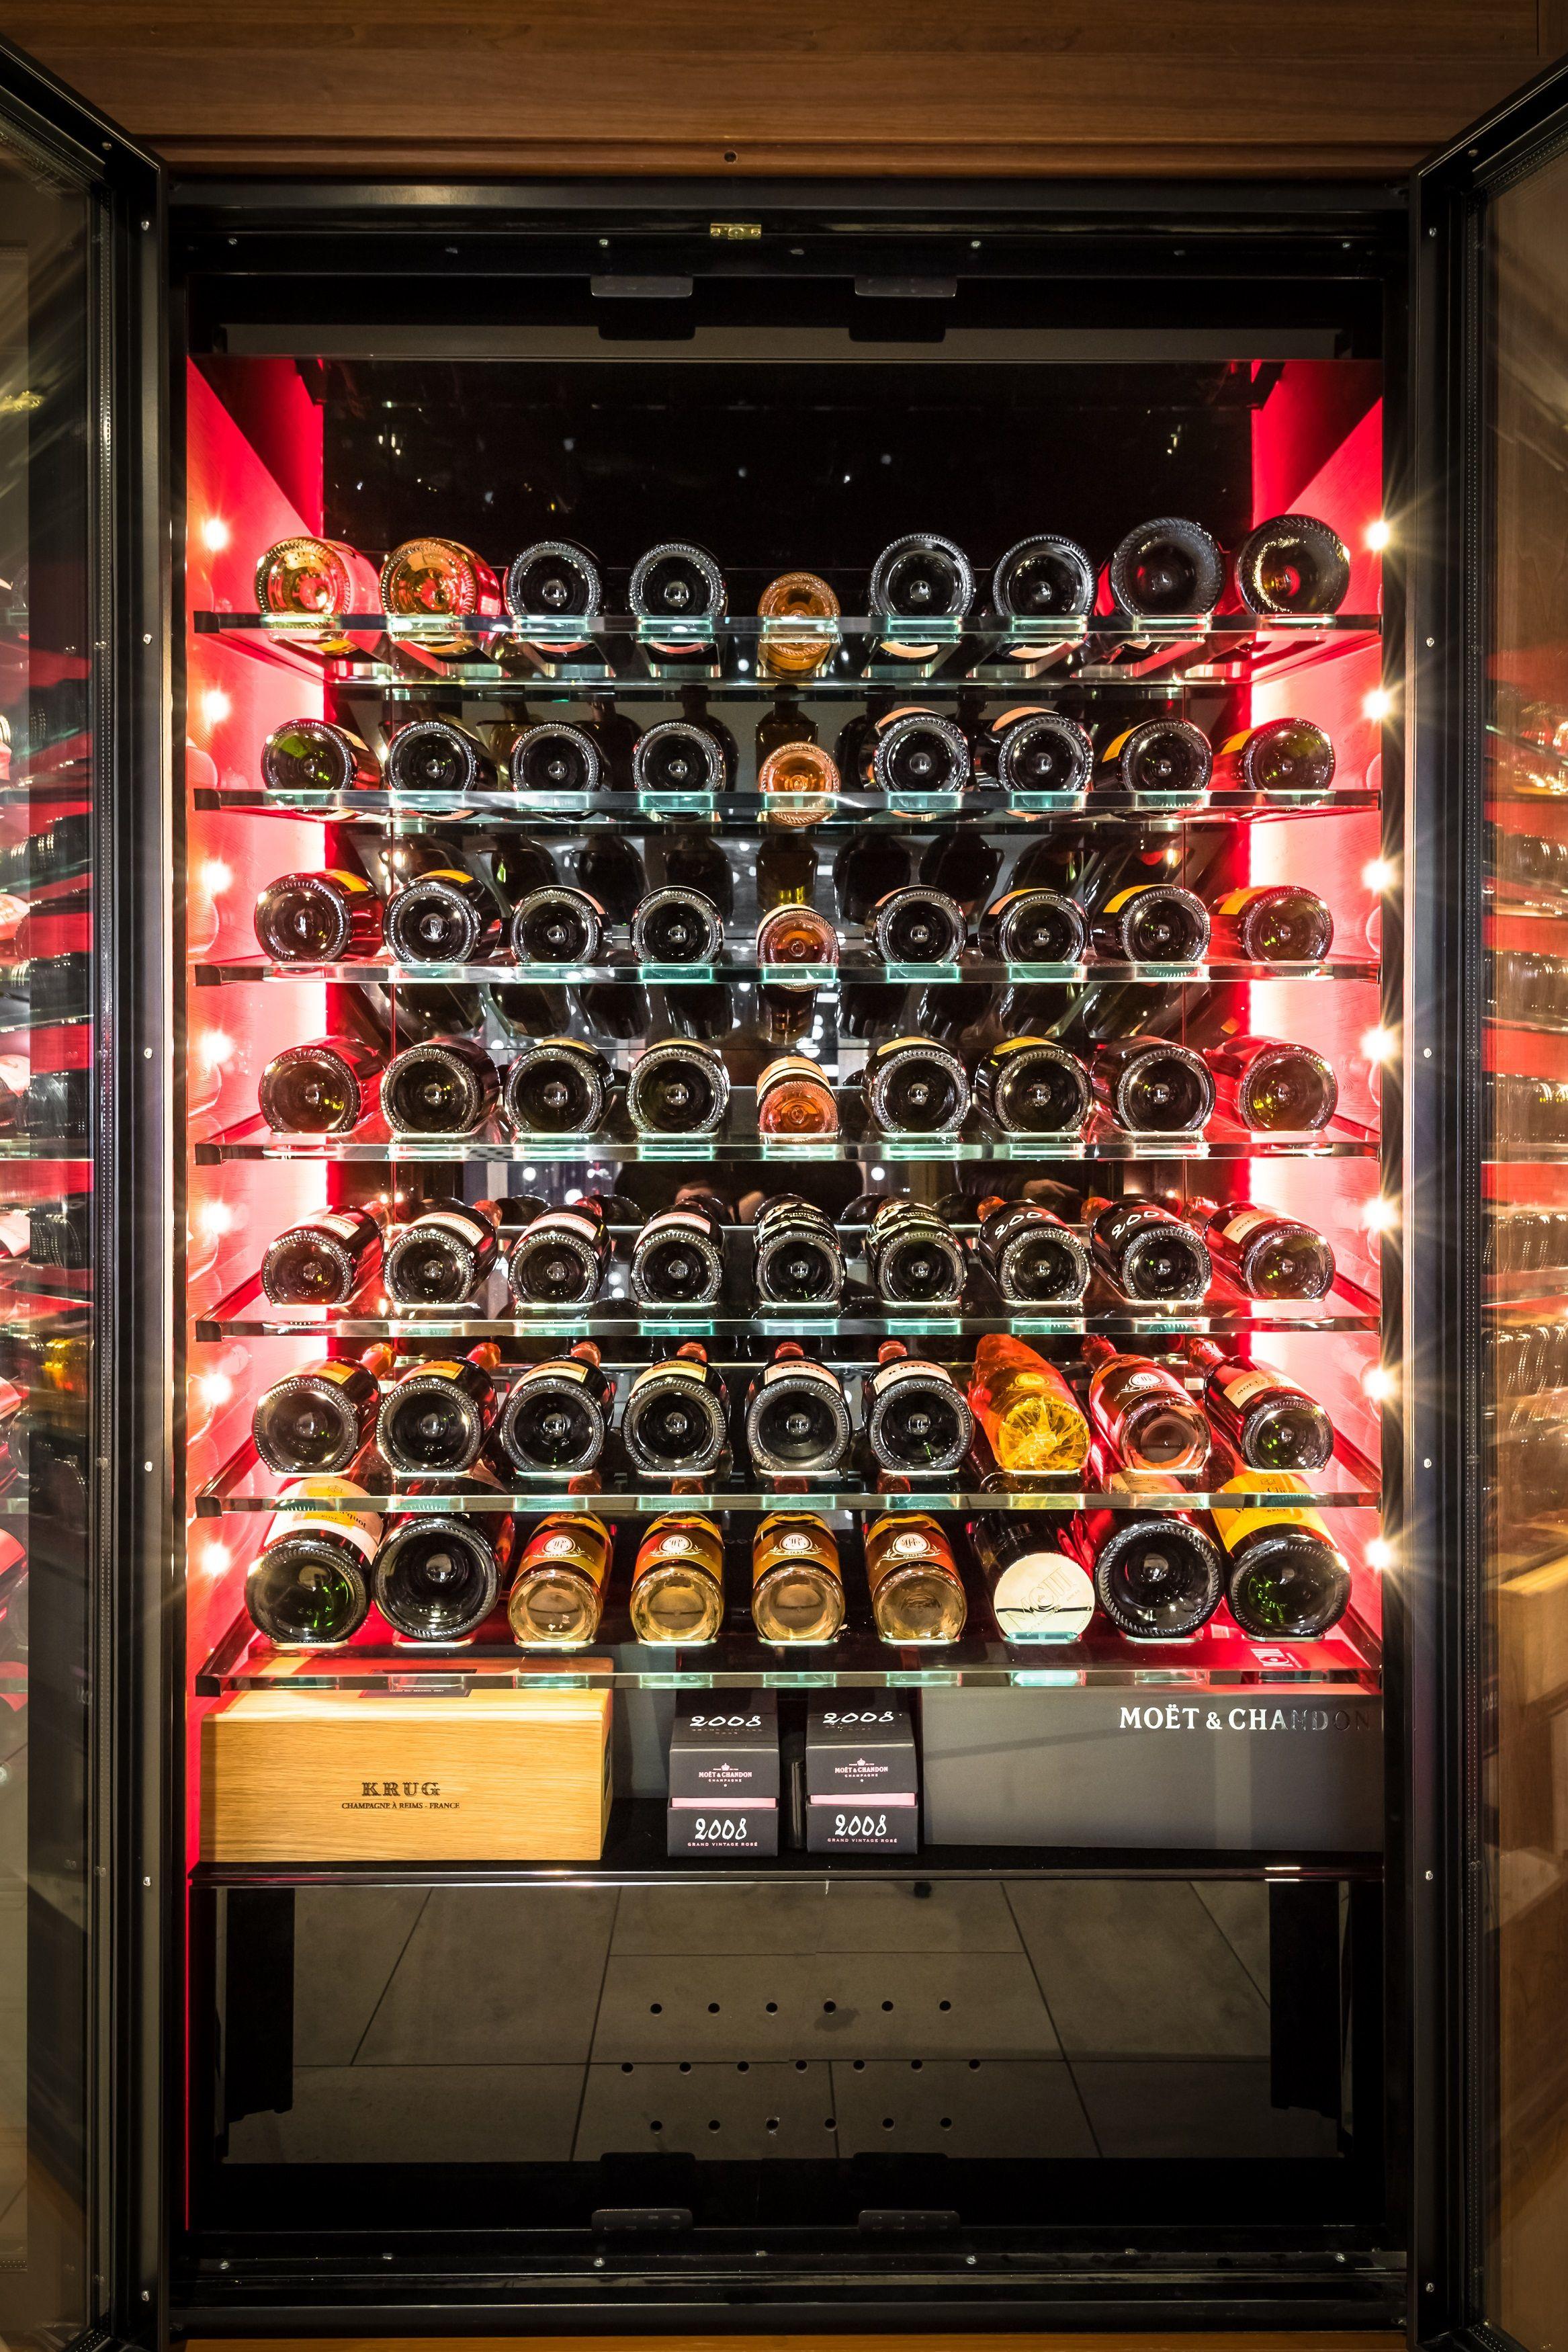 Armoire A Vin Vitree Design Sur Mesure Luxury Wine Cabinet With